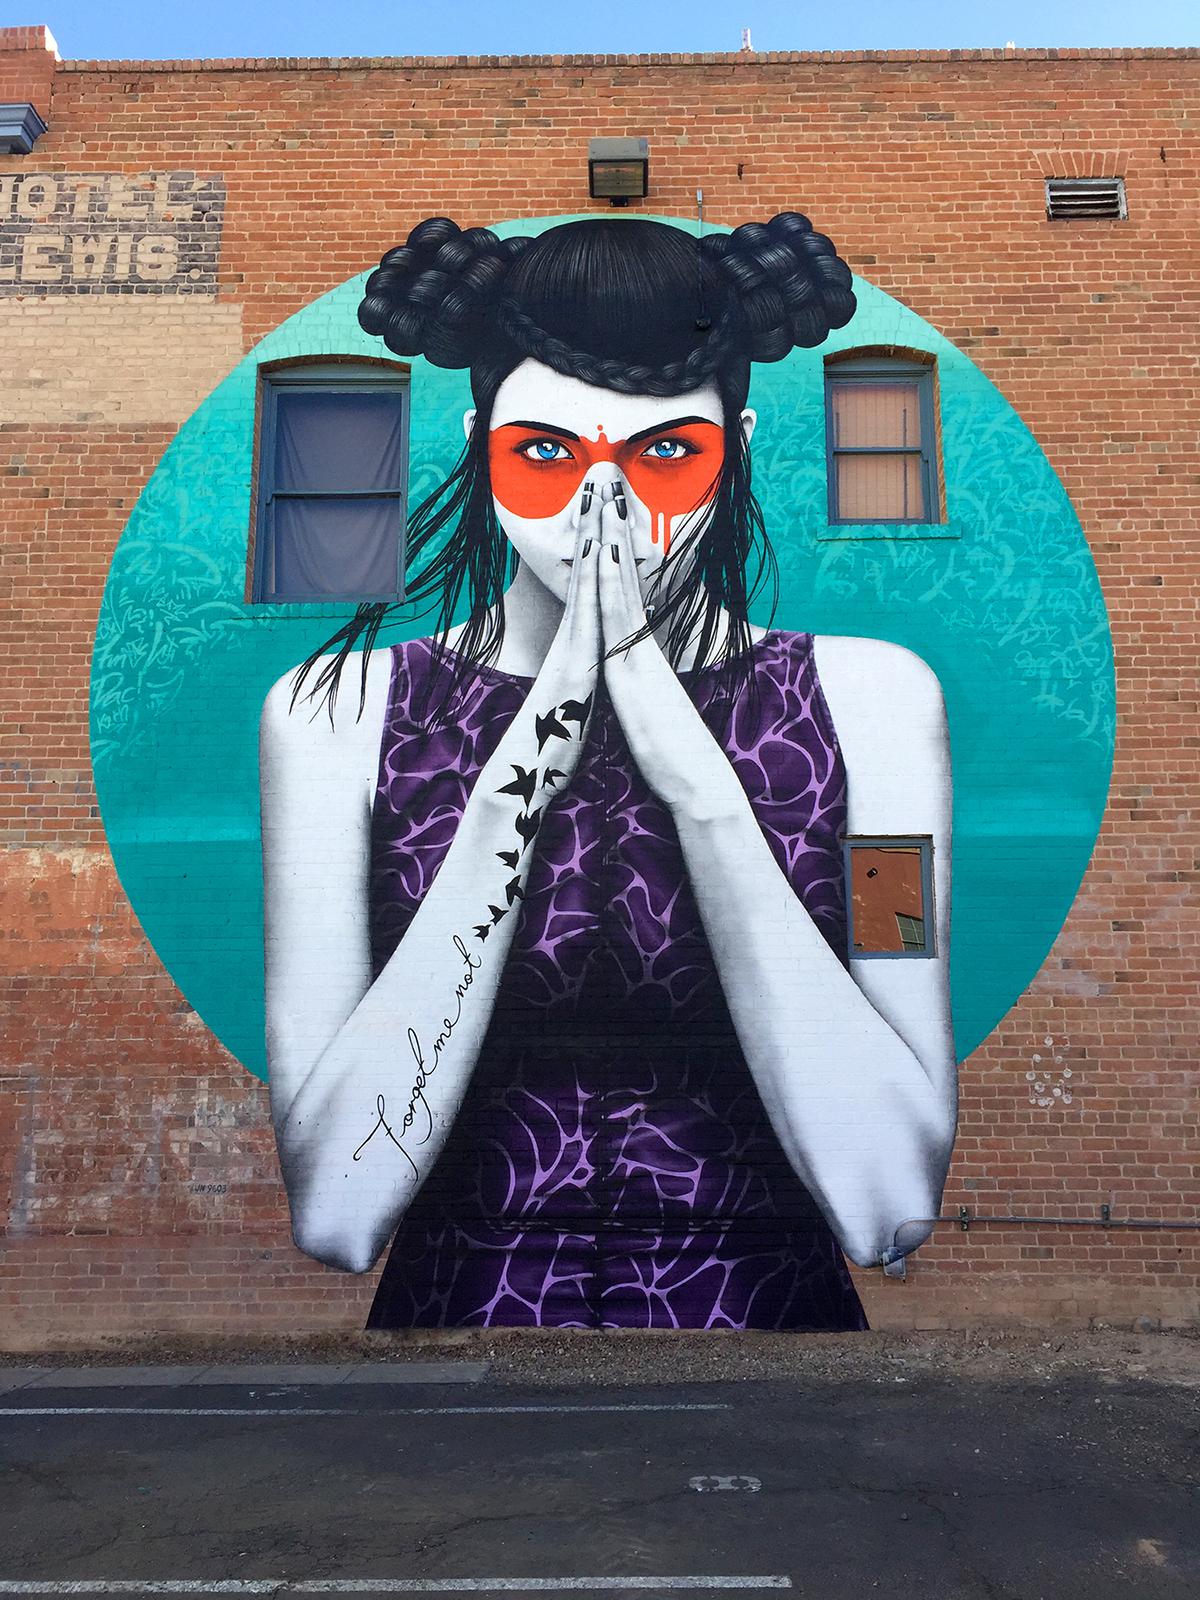 """Vergiss"" by Fin DAC in Tucson, Arizona"